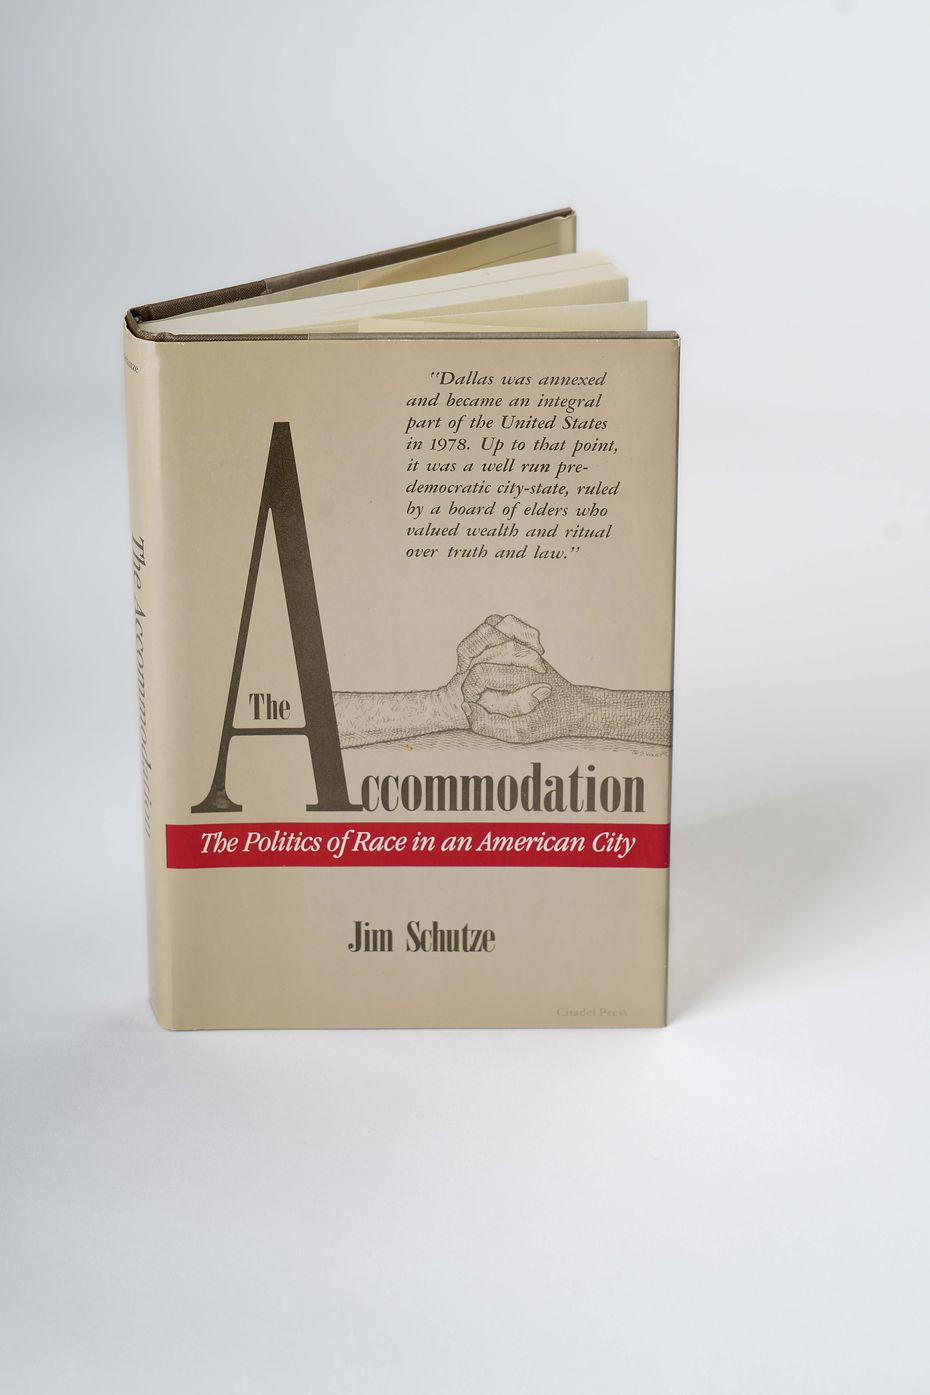 'The Accommodation' by Jim Schutze